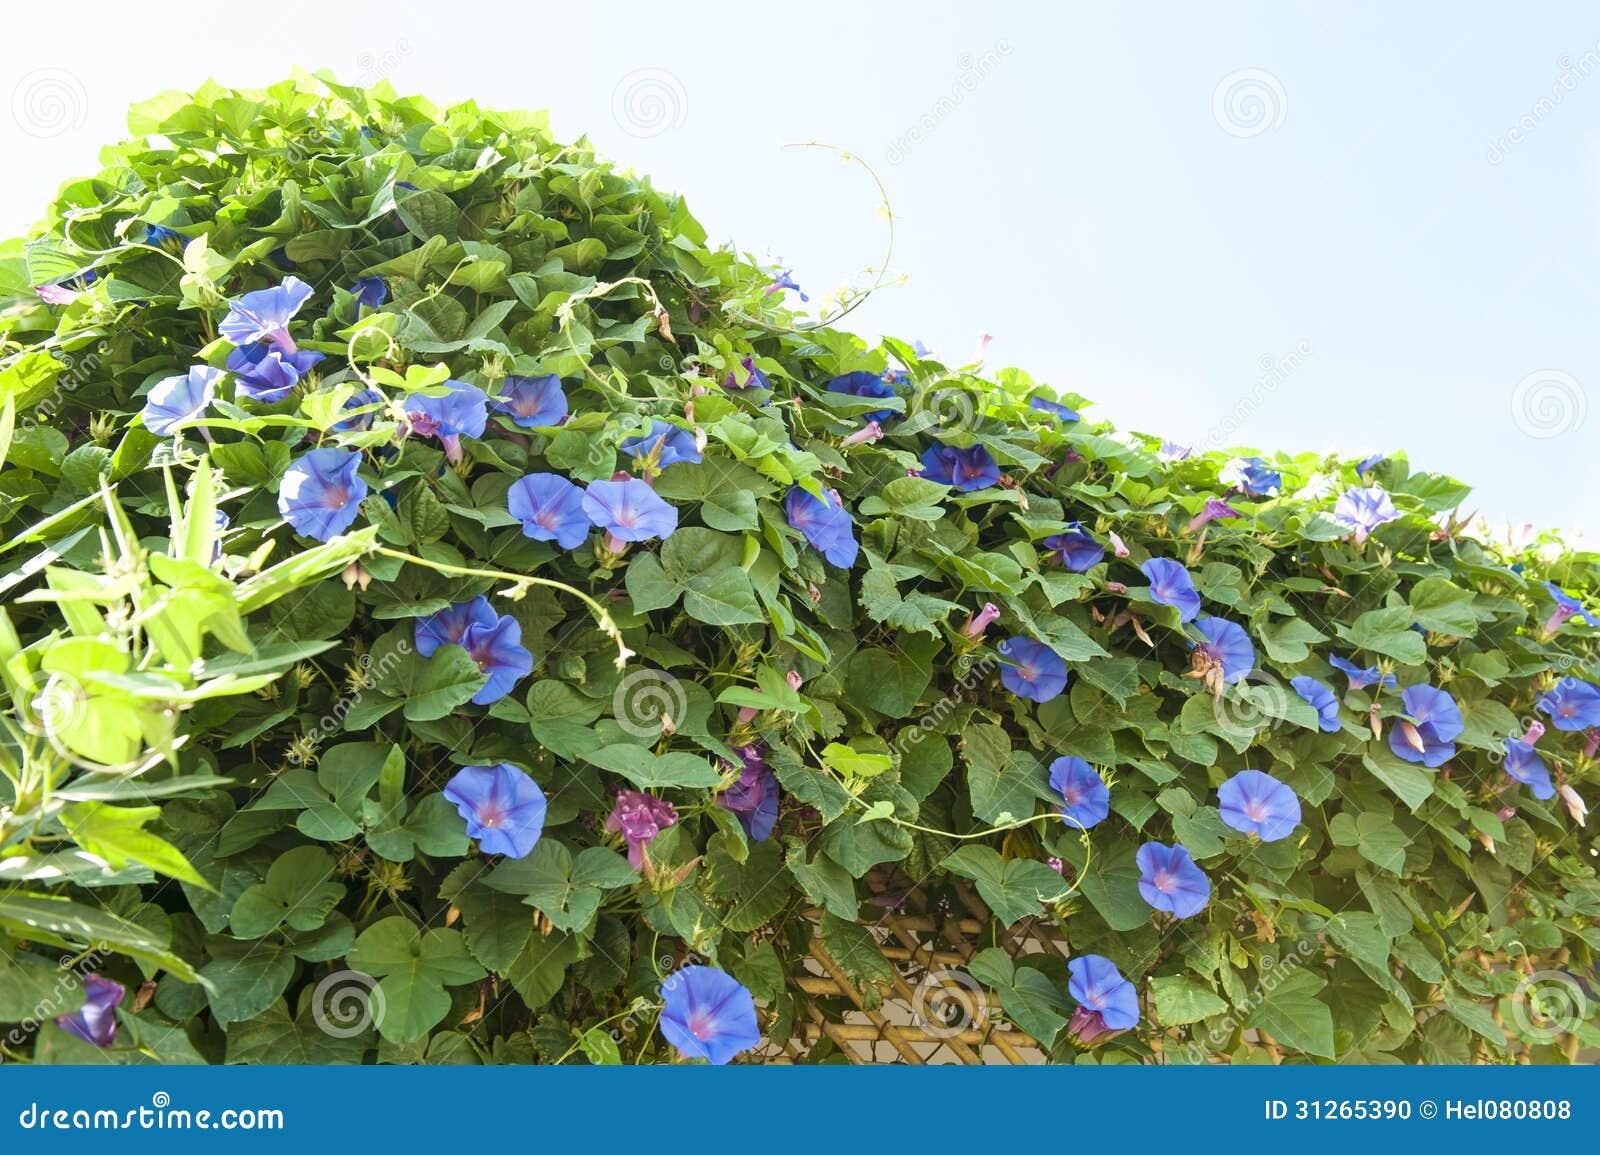 Blue creeping flowers stock photo image of bloom colors 31265390 blue creeping flowers izmirmasajfo Images